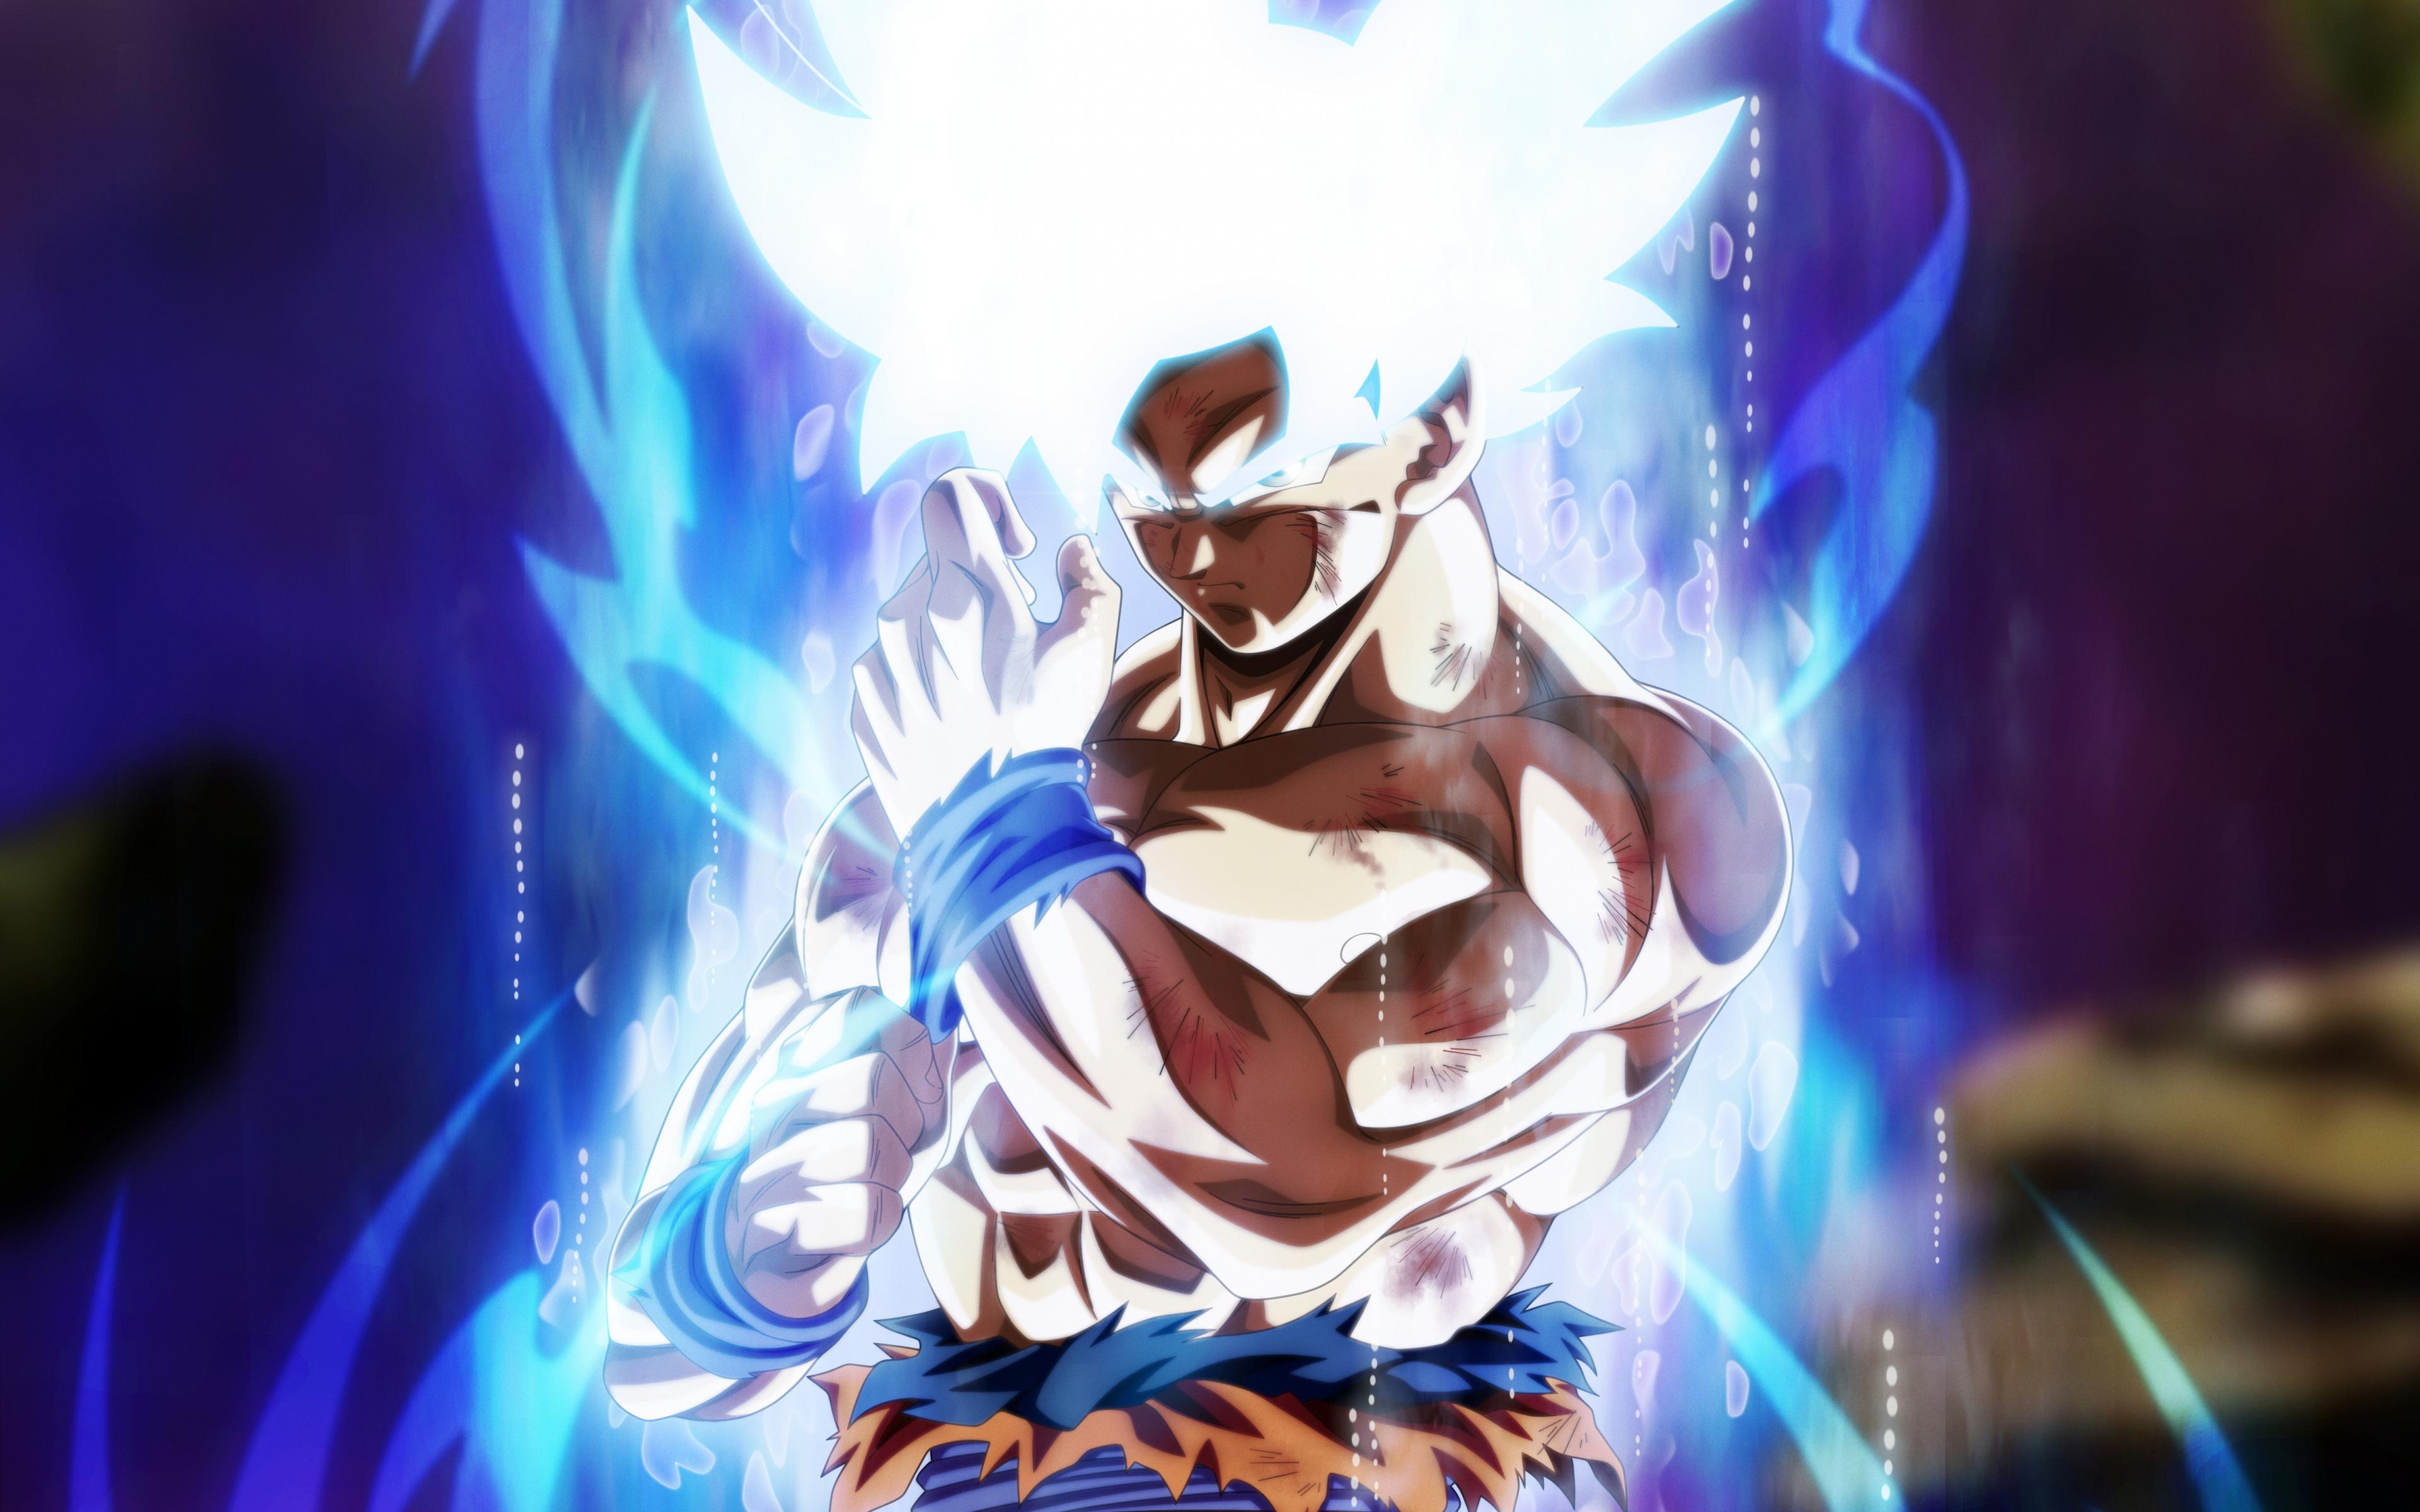 Download 3840x2400 Wallpaper Goku Dragon Ball Super Fan Art